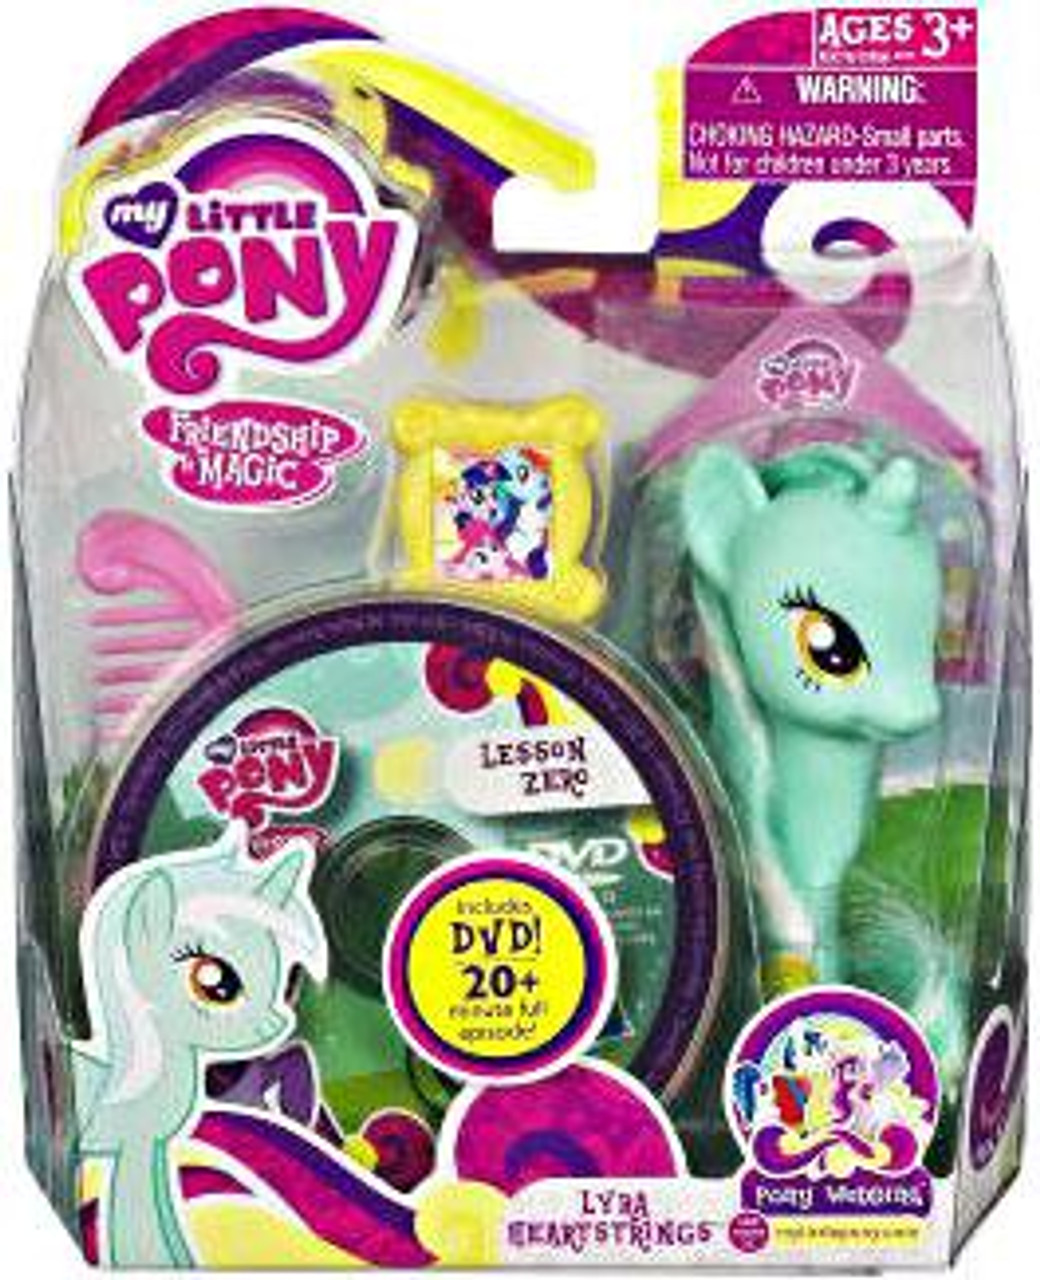 My Little Pony Friendship is Magic Pony Wedding Lyra Heartstrings & Lesson Zero DVD Figure Set